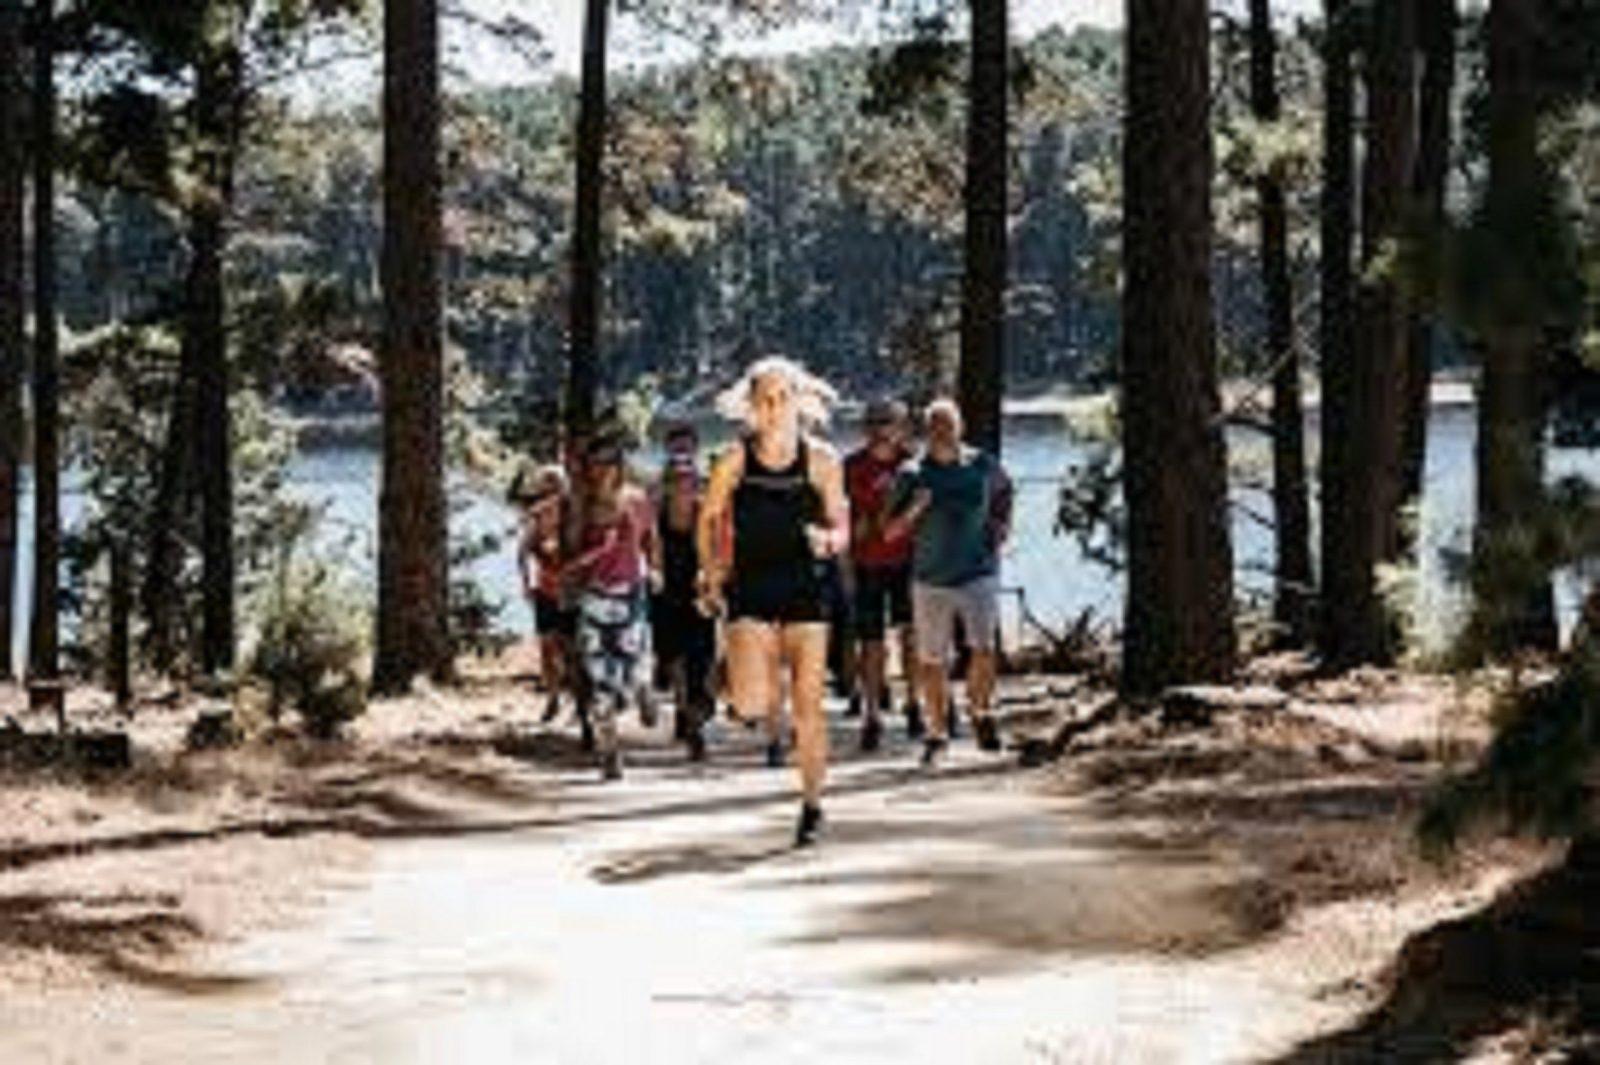 Walks, trails, recreation